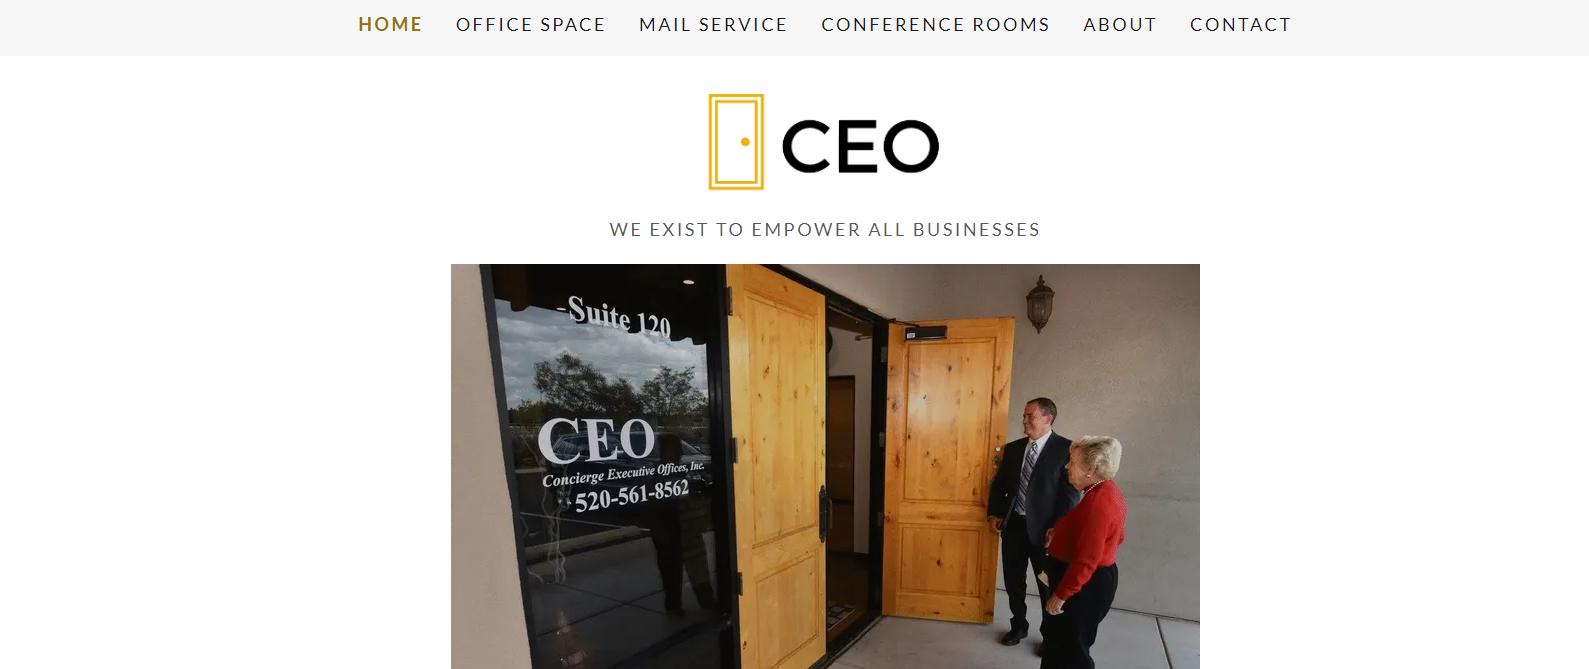 Concierge Executive Offices